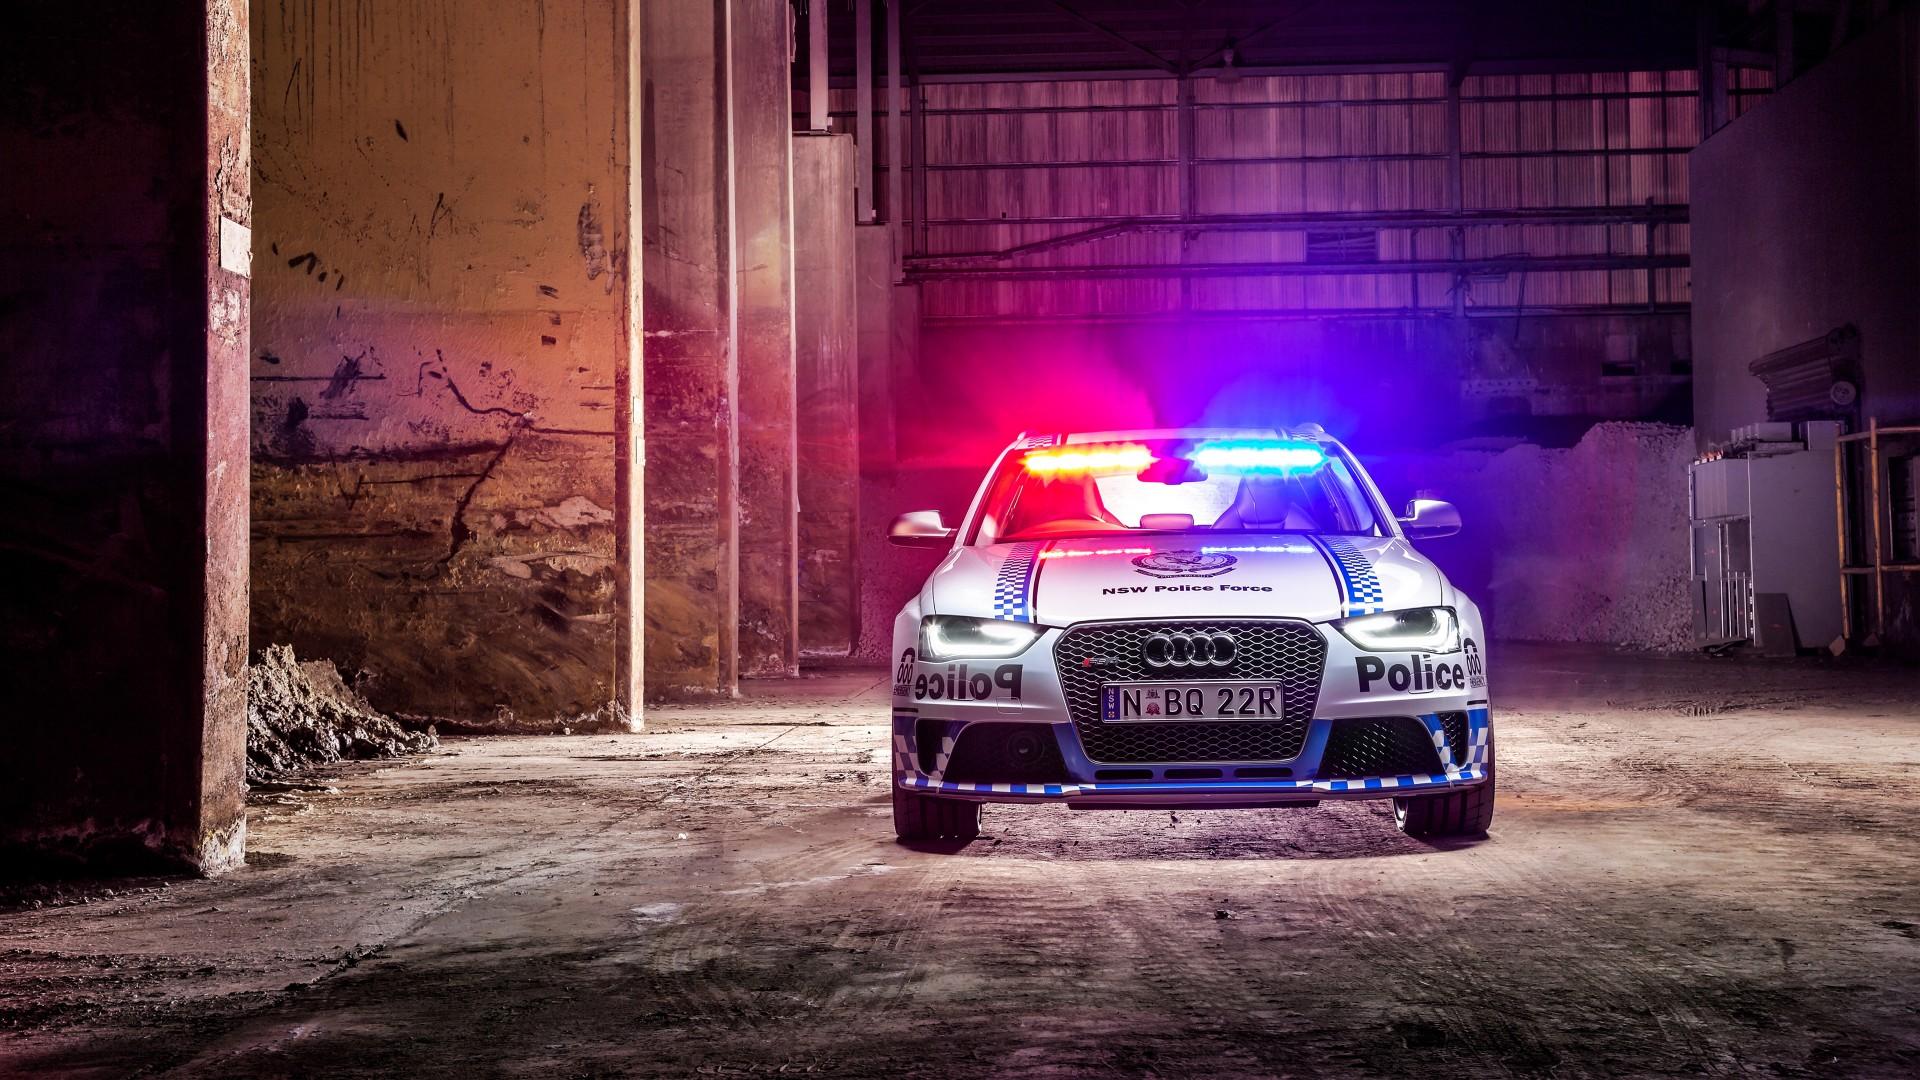 Badass Iphone Wallpaper 2015 Audi Rs4 Avant Police Wallpaper Hd Car Wallpapers